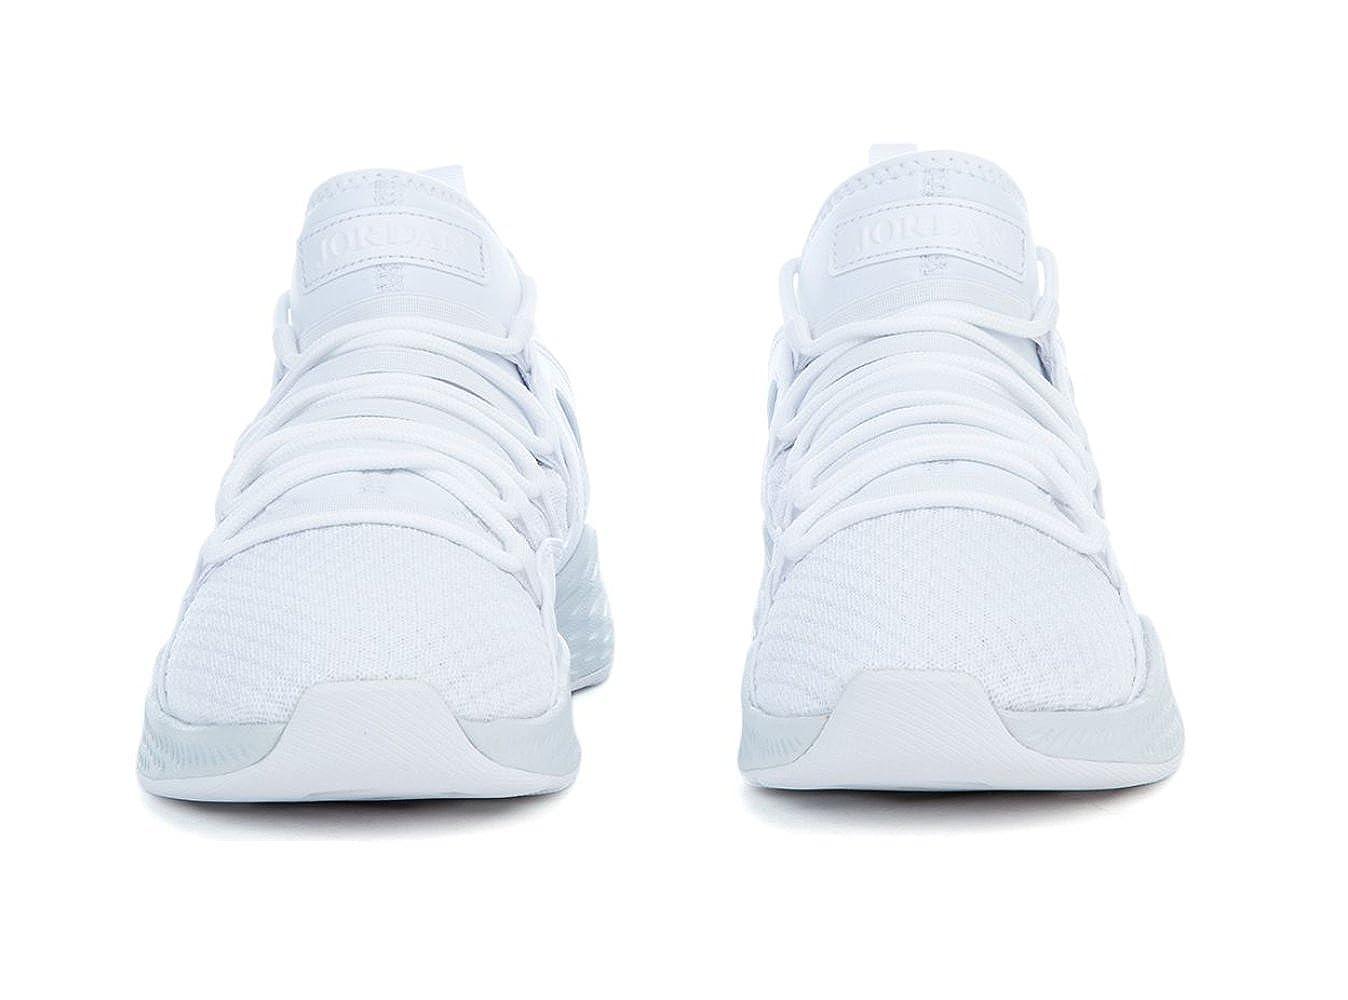 a7463aa1e17ae2 Nike Jordan Kid s Formula 23 BP White White-Pure Platinum Basketball Shoes  881467-120(12c)  Amazon.ca  Shoes   Handbags